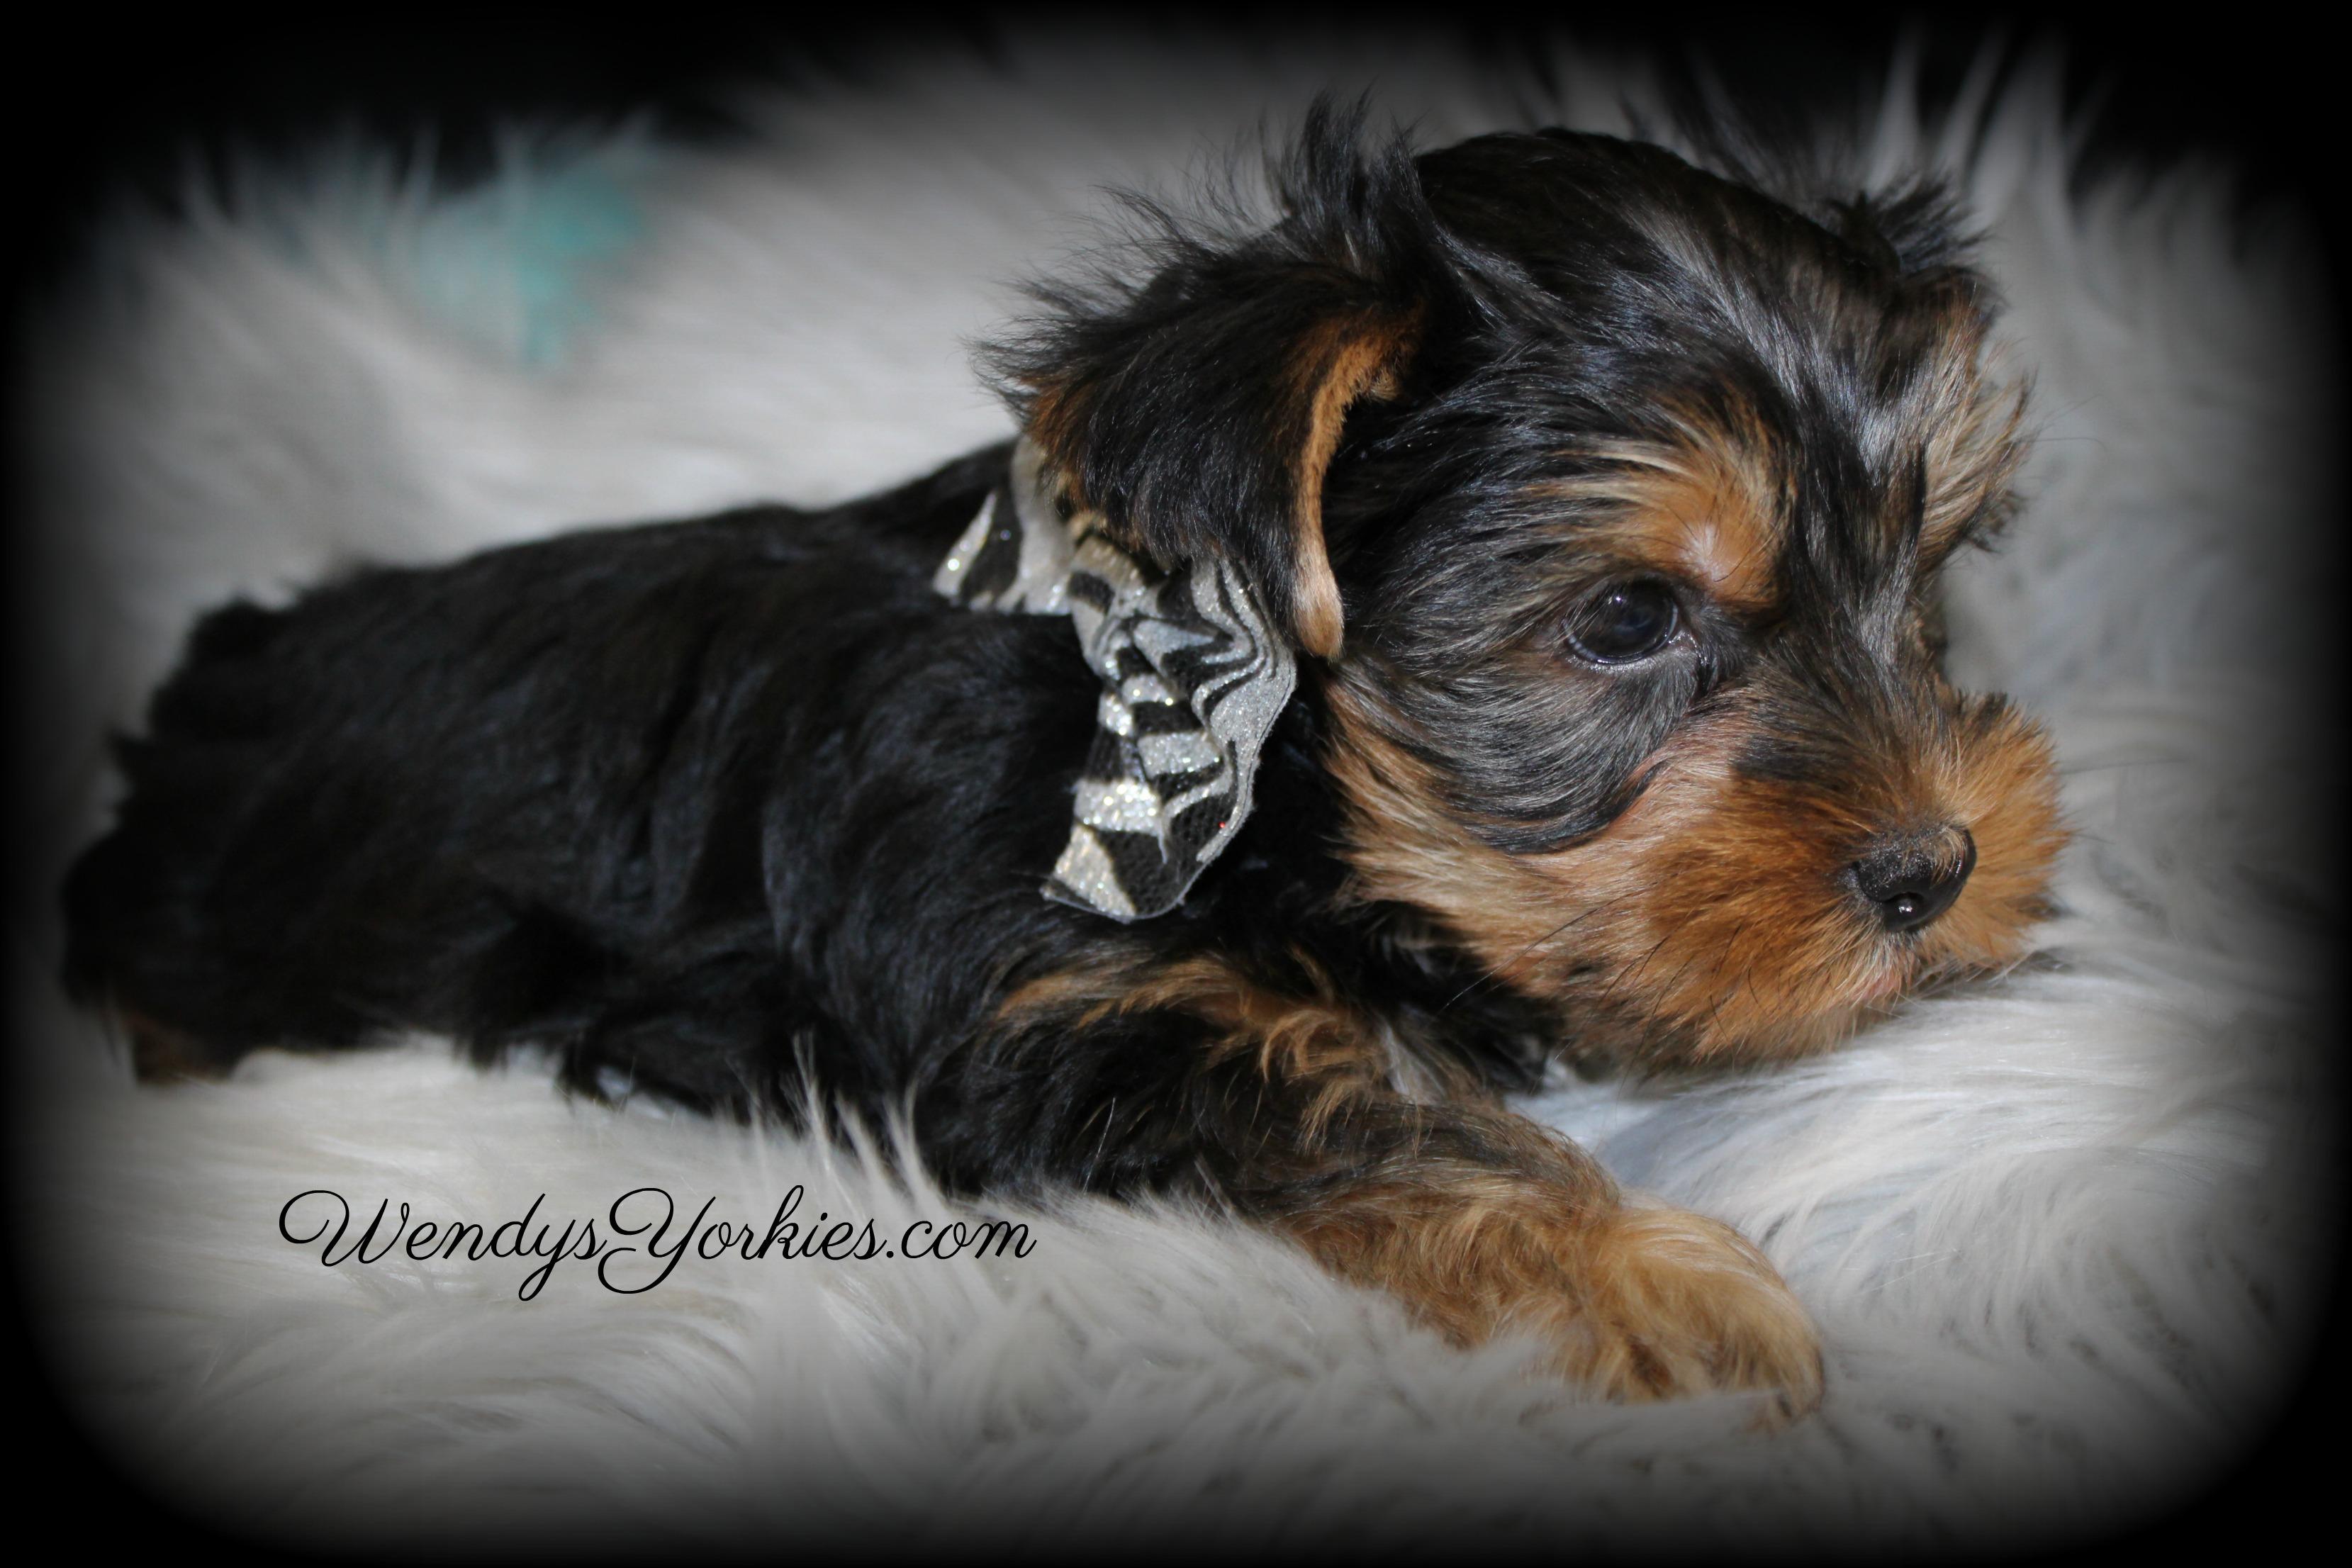 Male YOrkie puppy, WendysYorkies.com